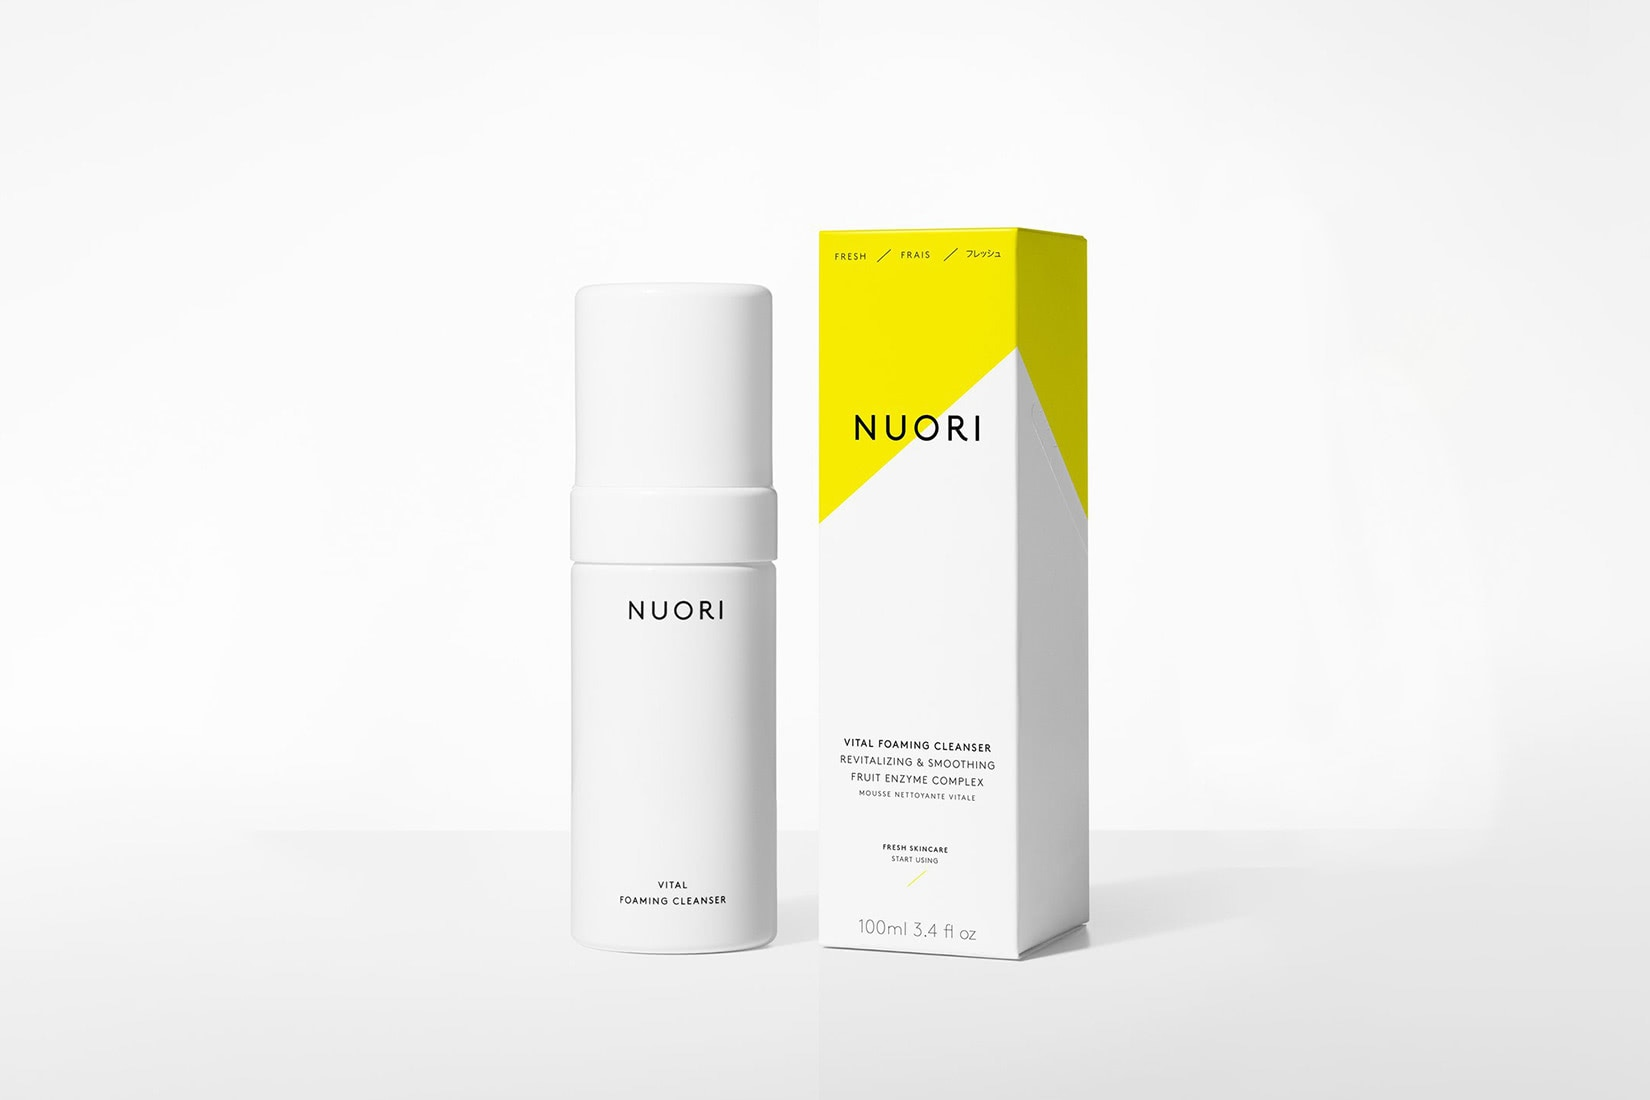 best natural organic beauty skincare nuori vital foaming cleanser - Luxe Digital